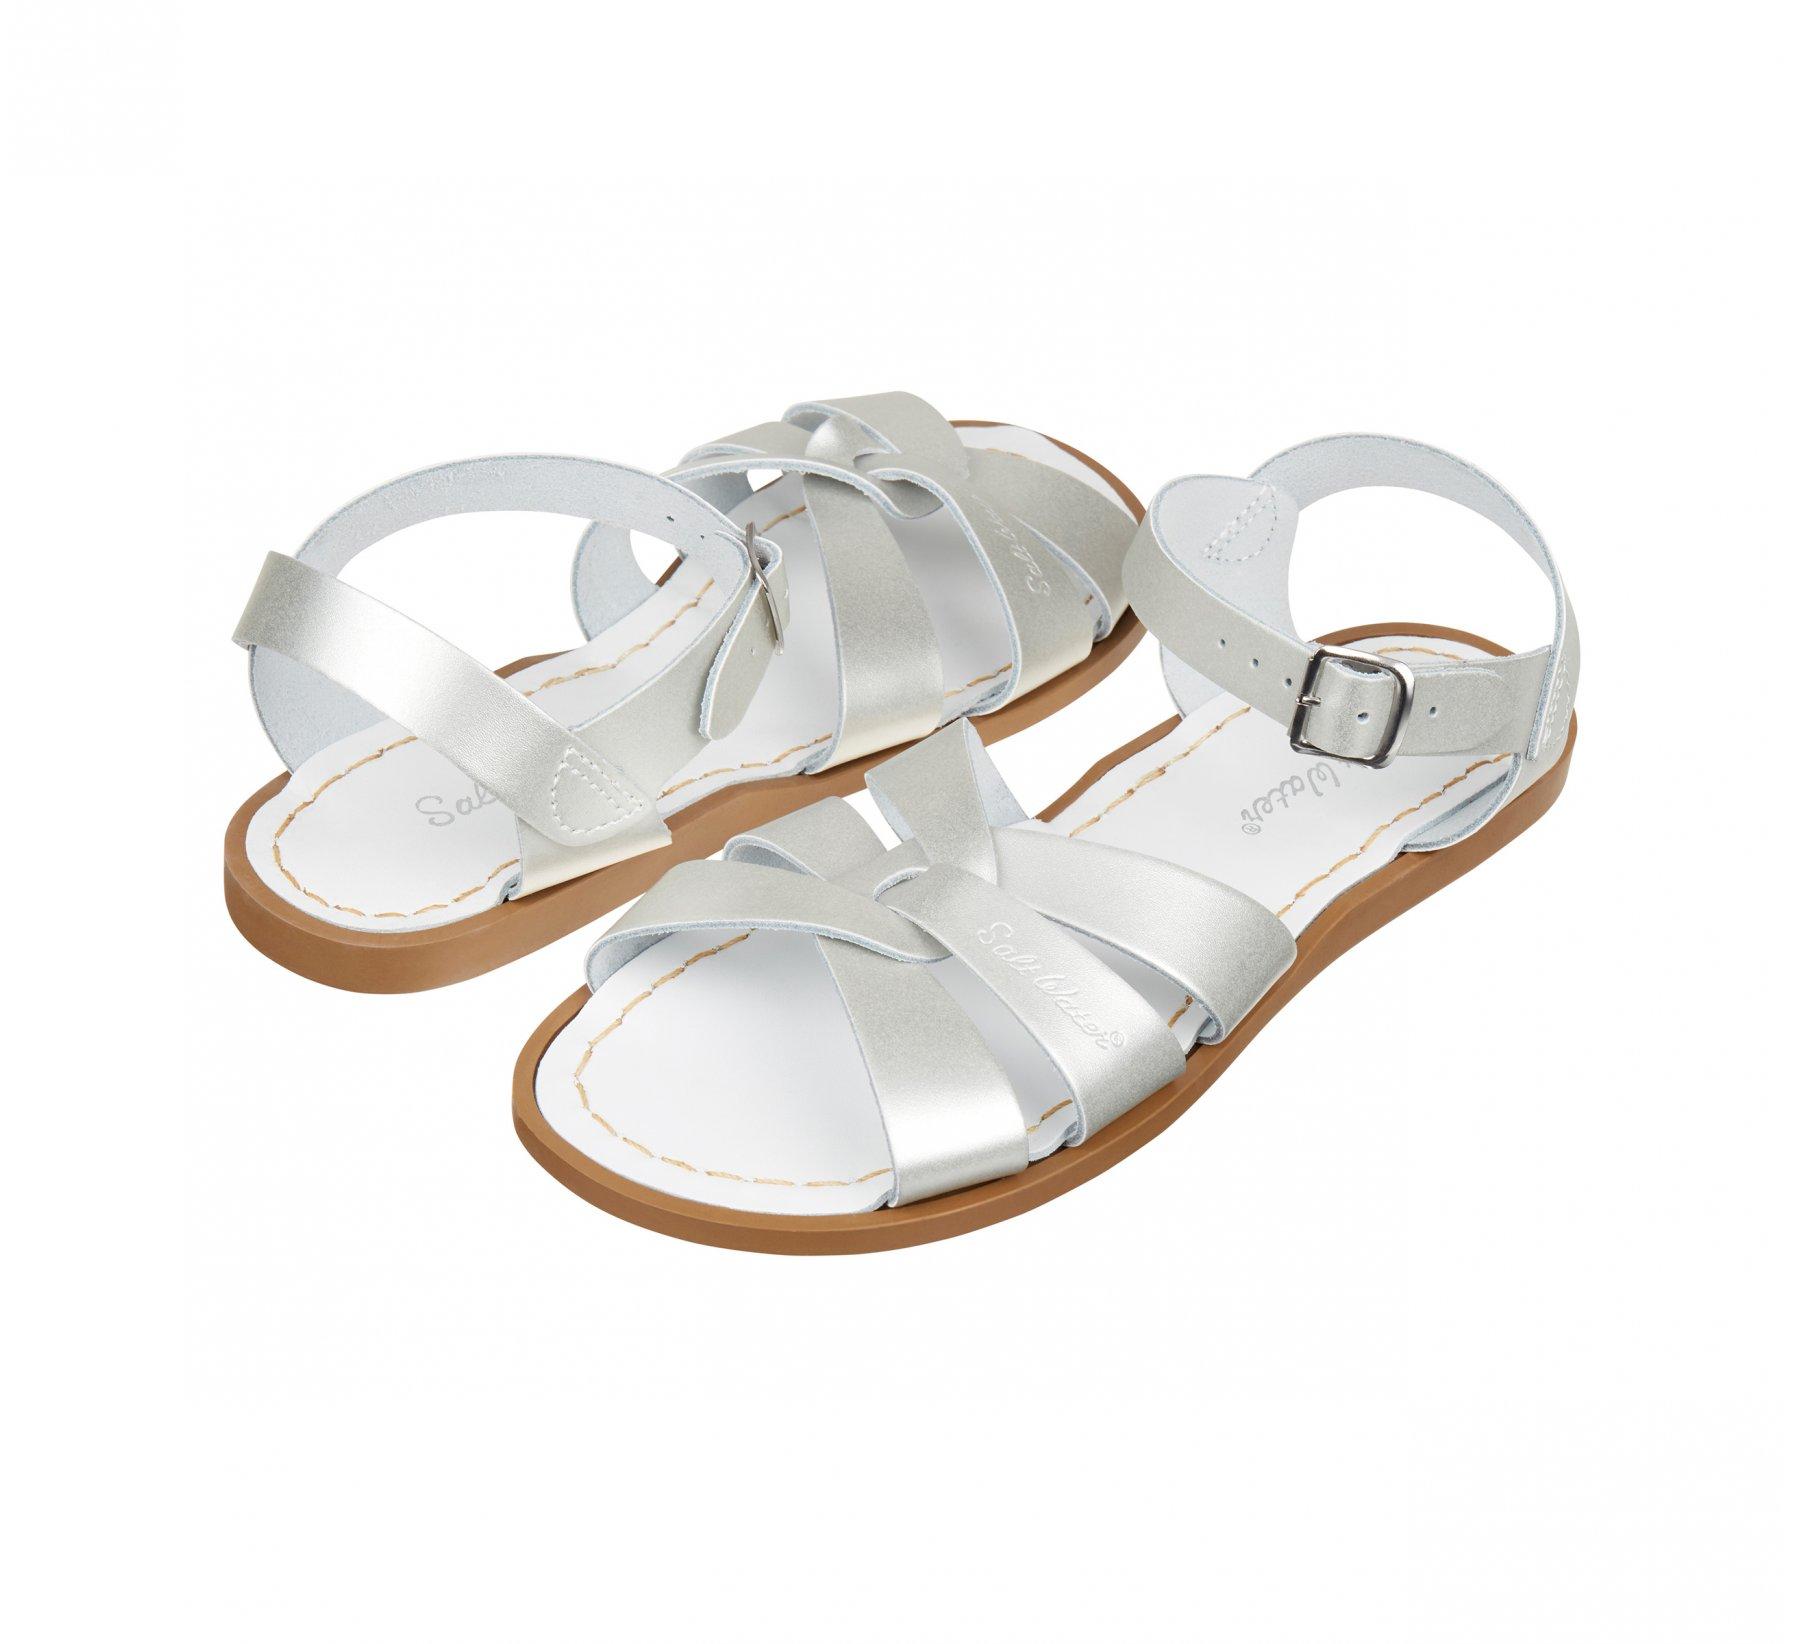 Original Silver  - Salt Water Sandals